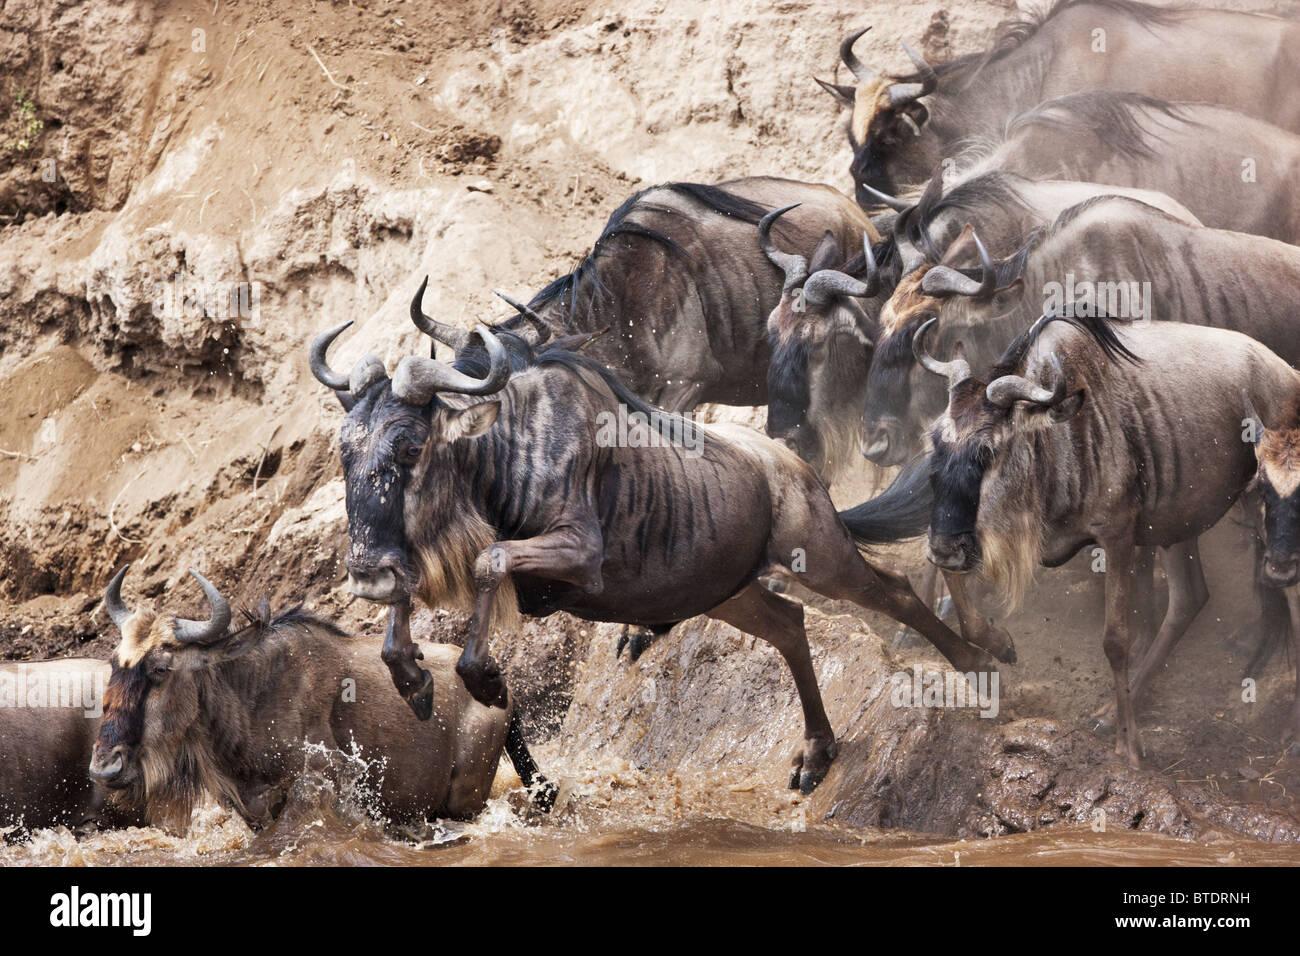 Migrazione di gnu attraversando il fiume Mara.Masai Mara riserva nazionale. Kenya Immagini Stock